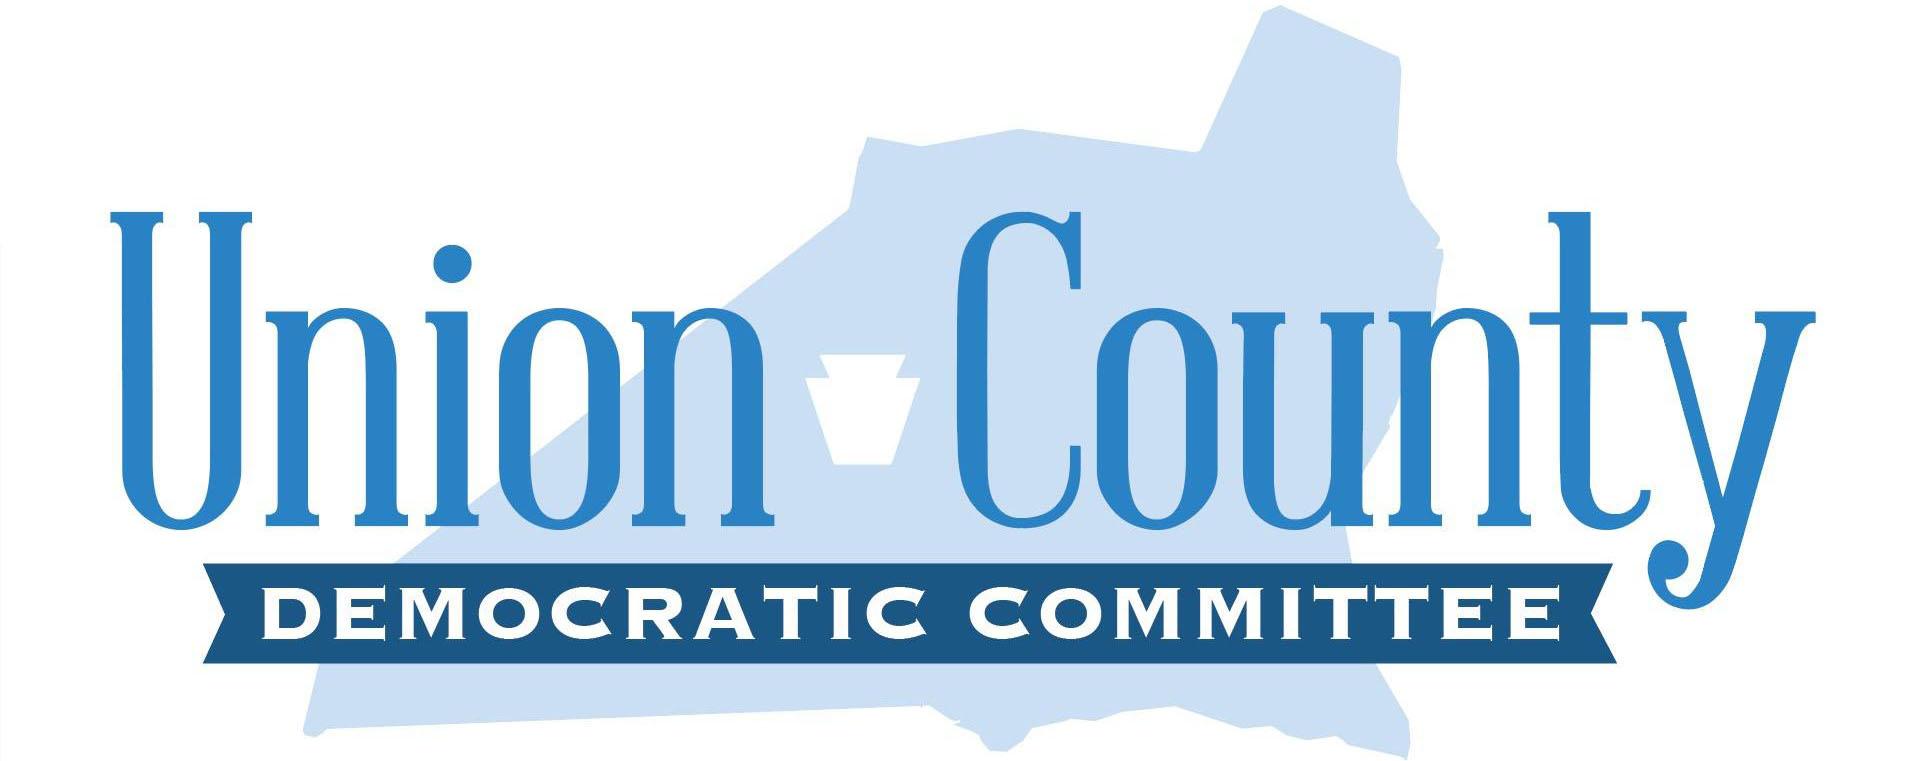 Union County Democratic Committee